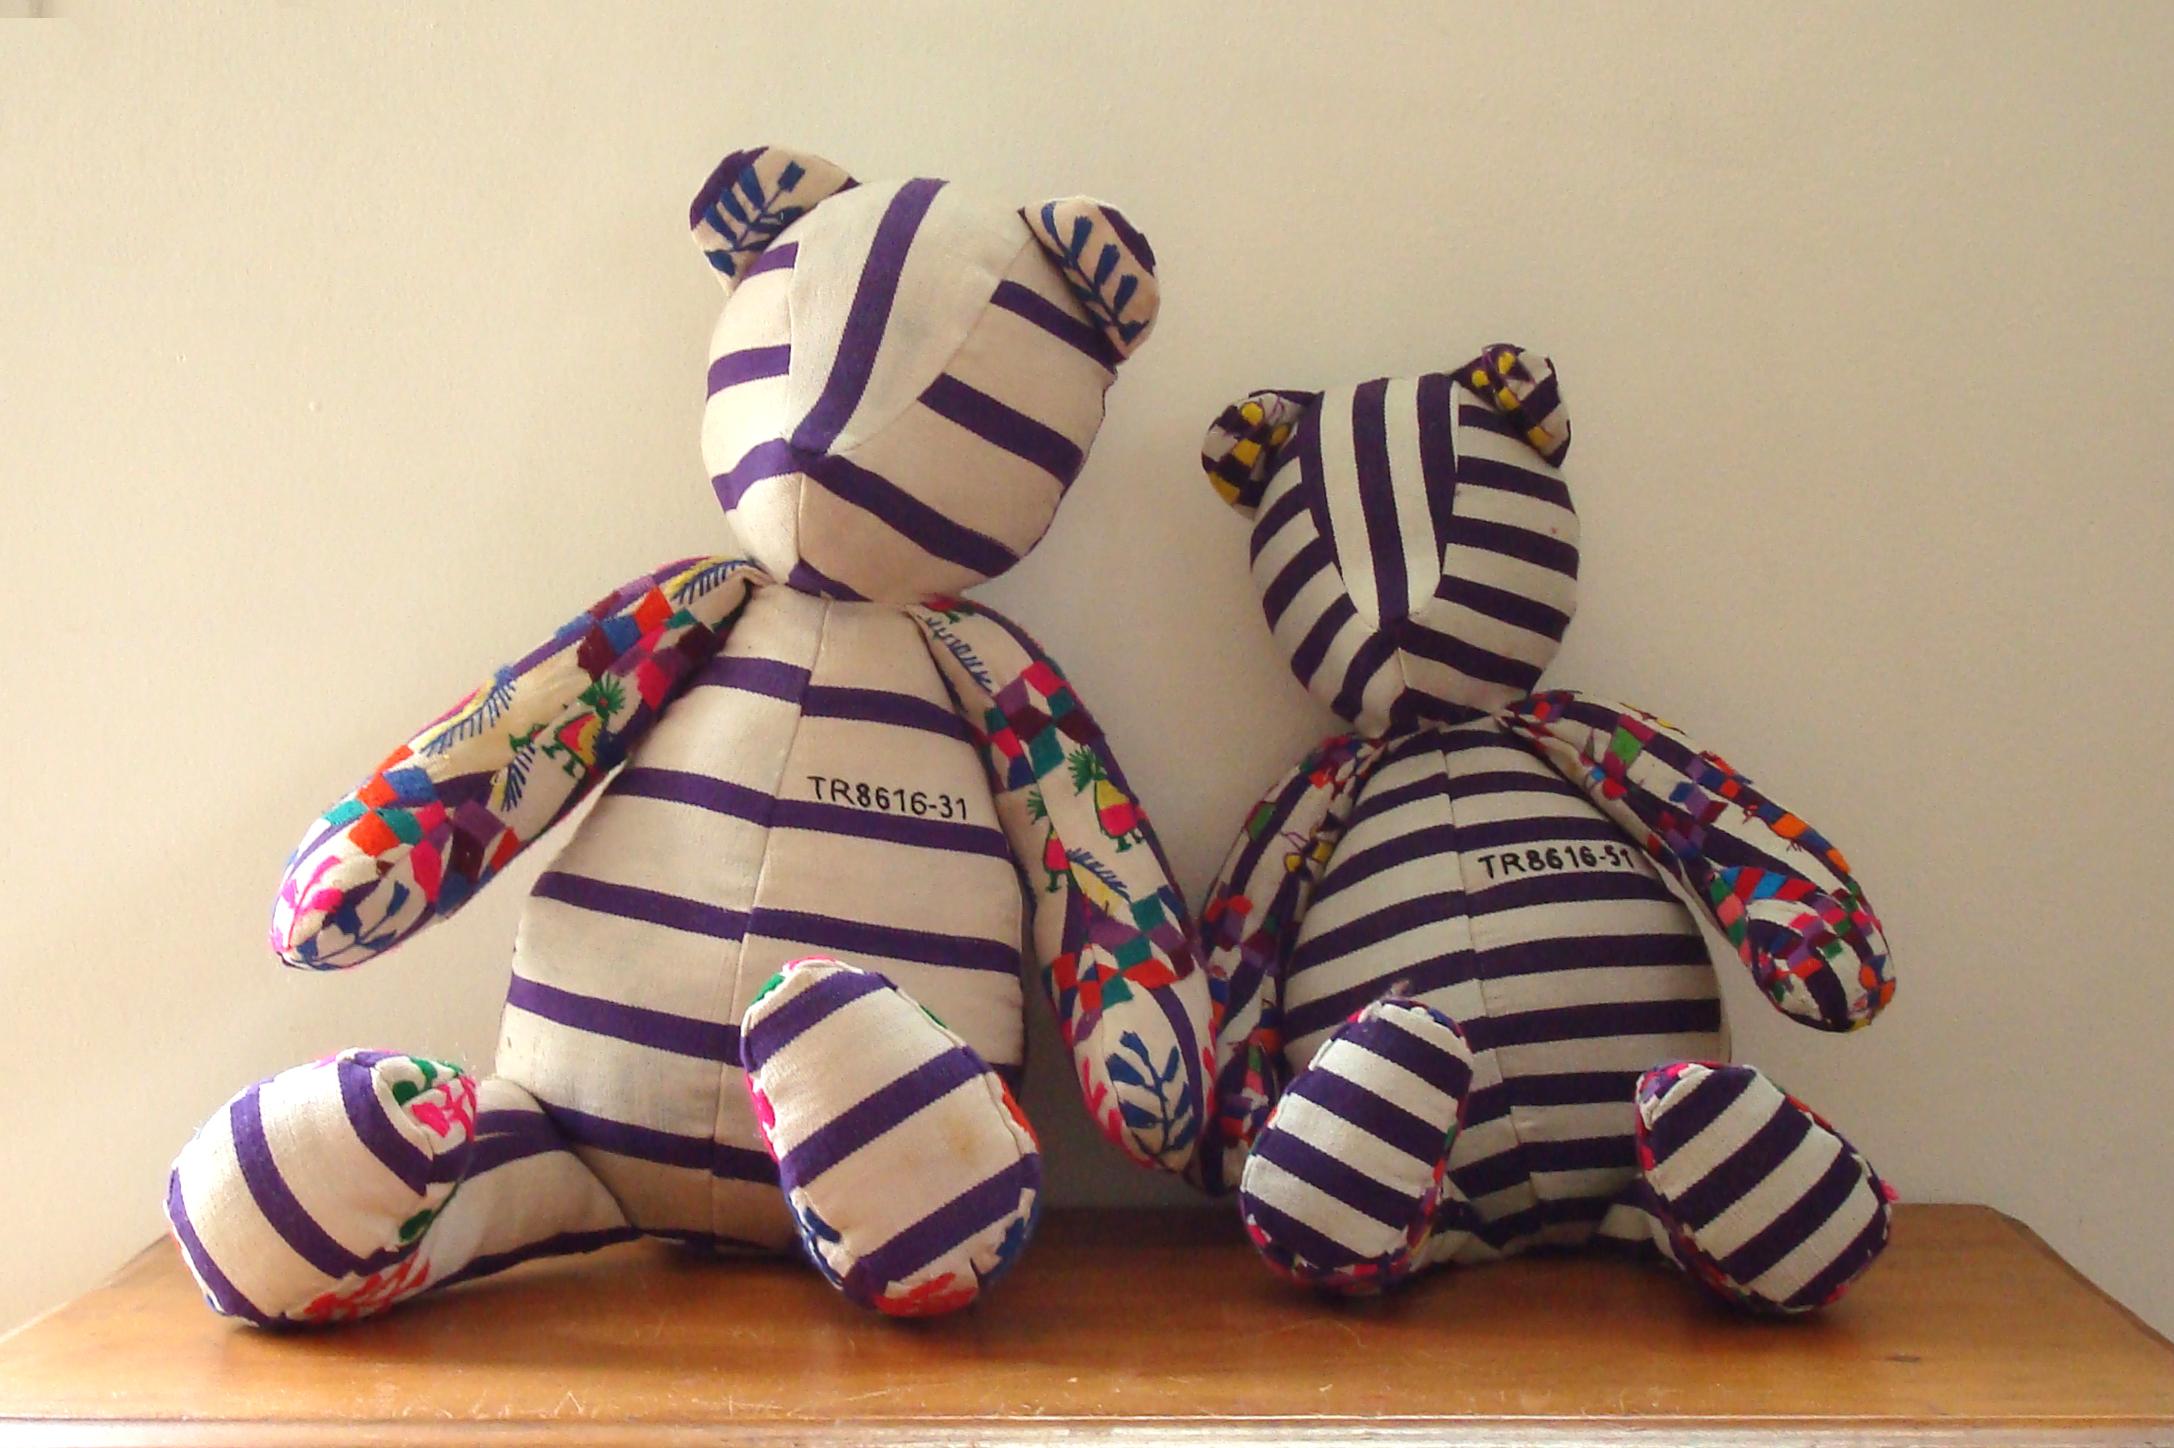 Guatamalan Pants After (Teddy Bears).jpg